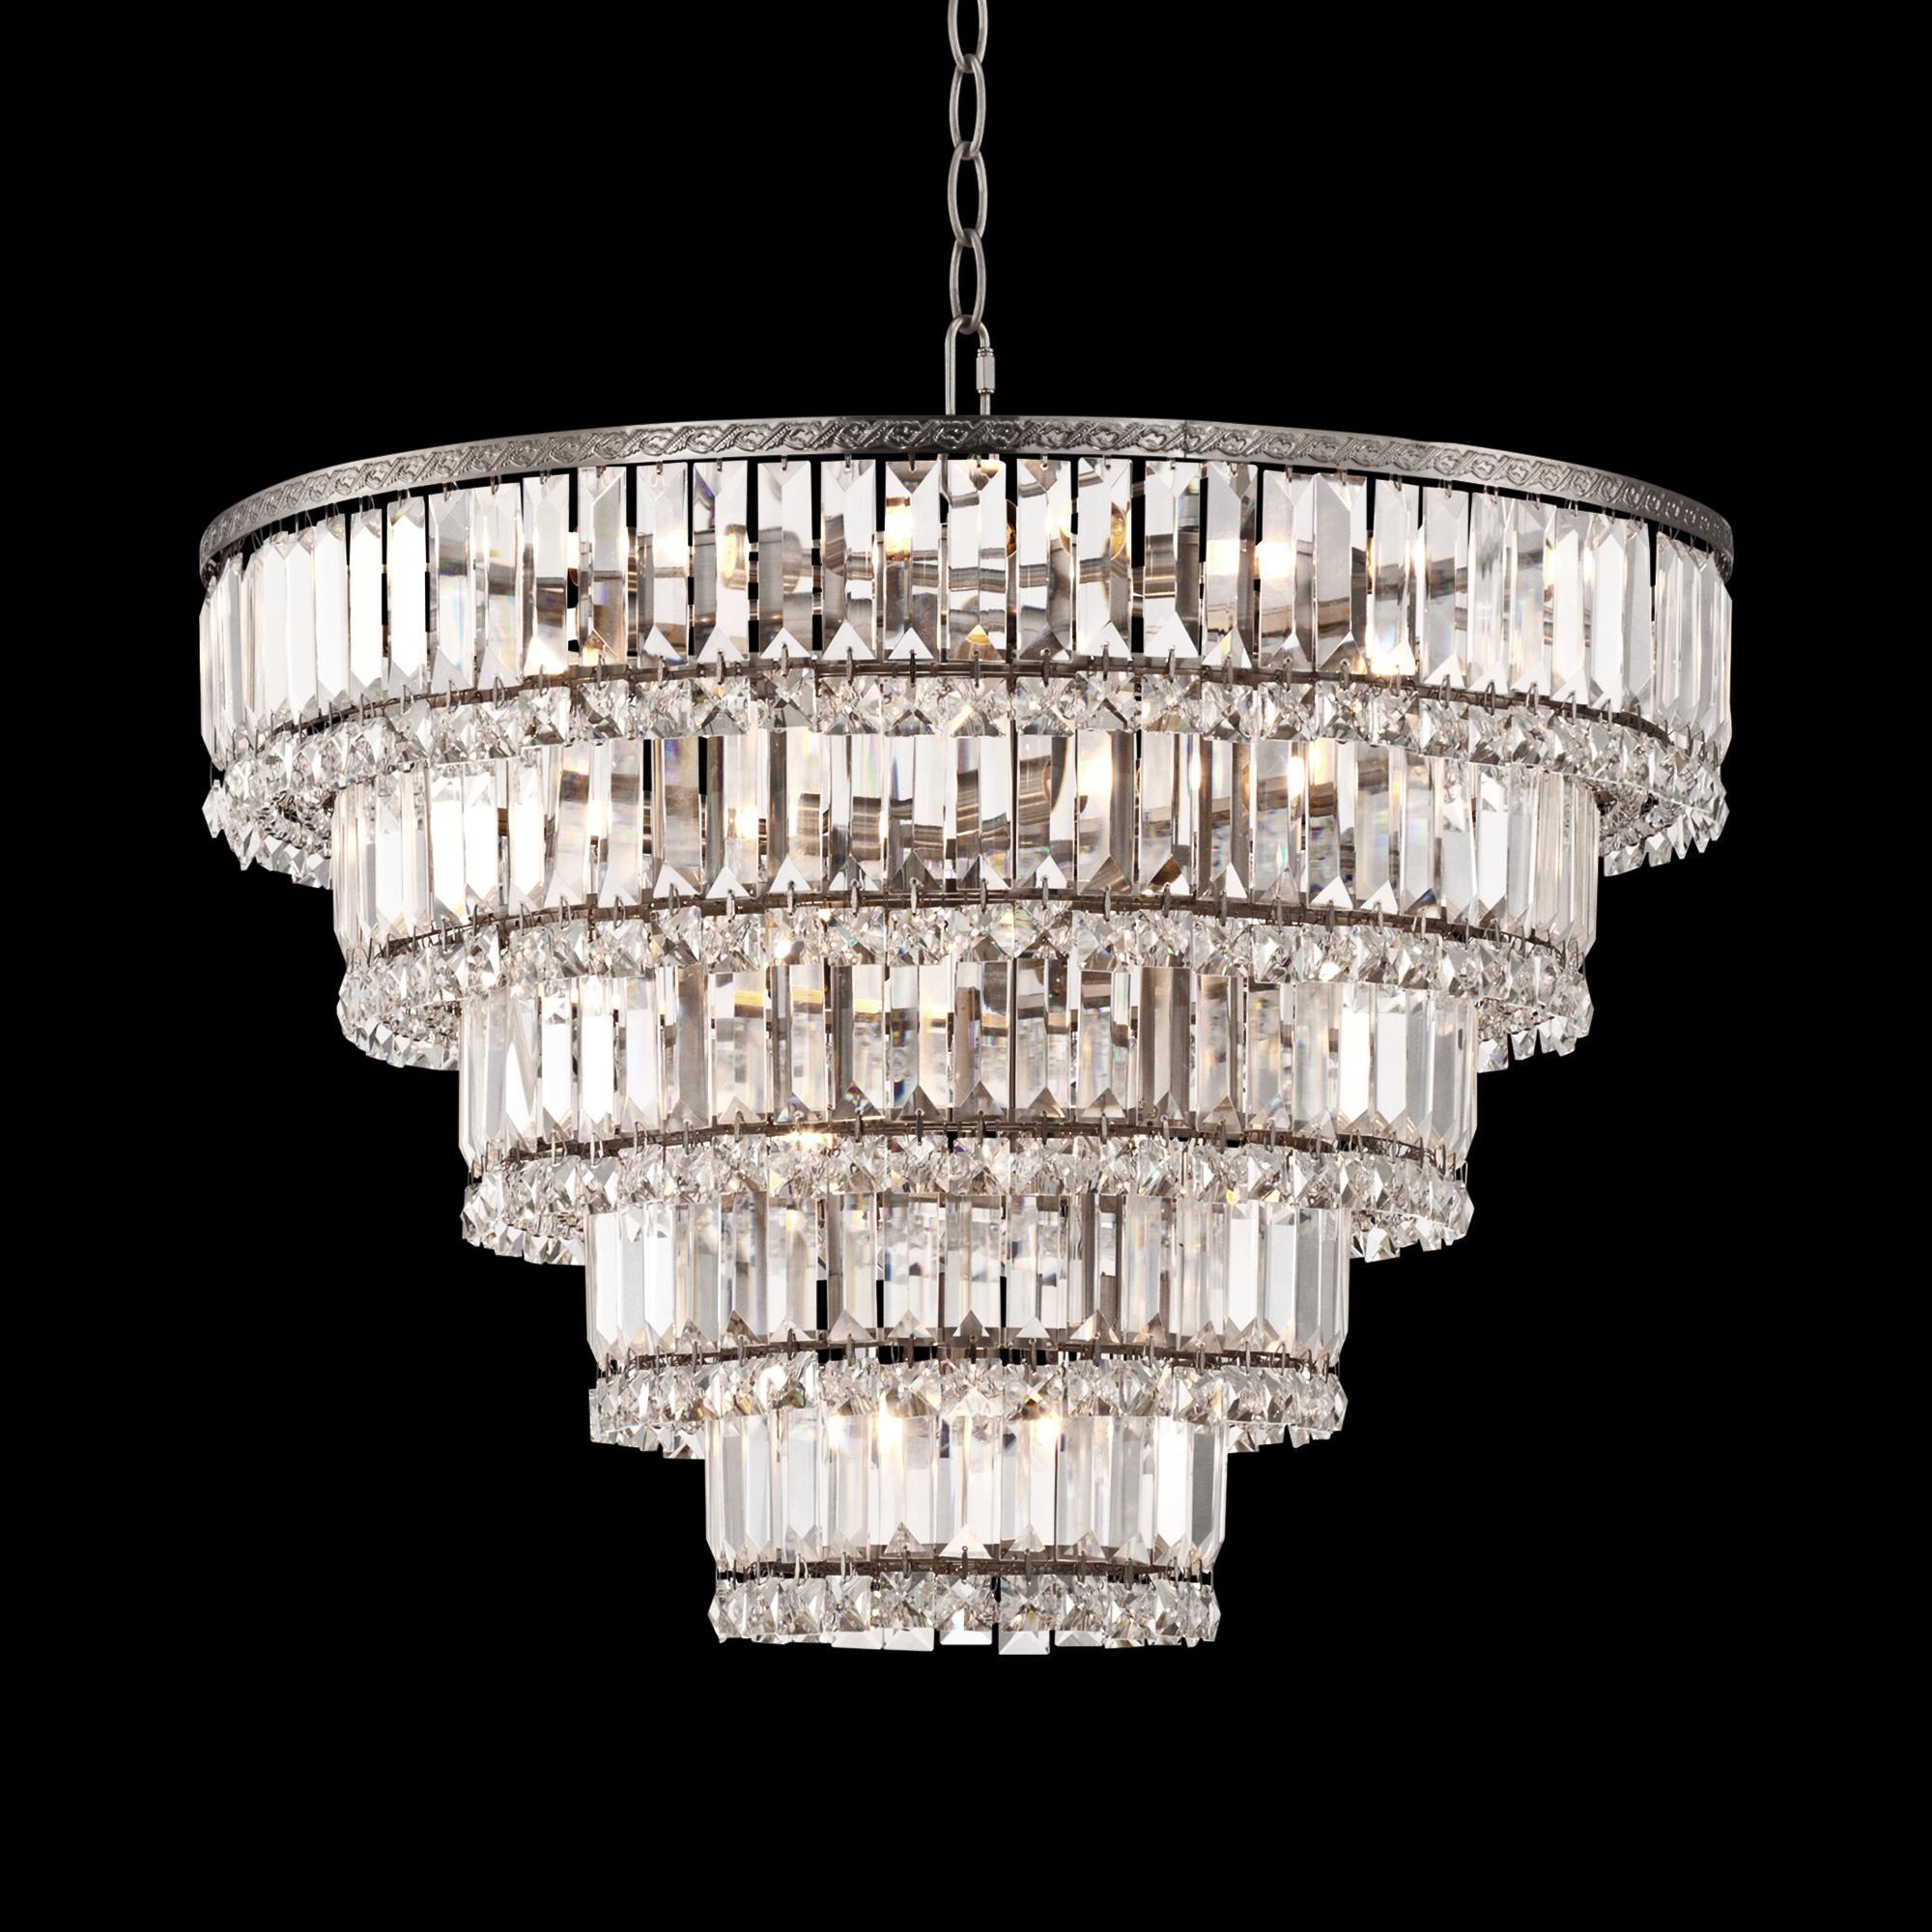 Magnificence Satin Nickel 24 1 2 Wide Crystal Chandelier 1d961 Lamps Plus Crystal Chandelier Crystal Ceiling Light Metal Chandelier